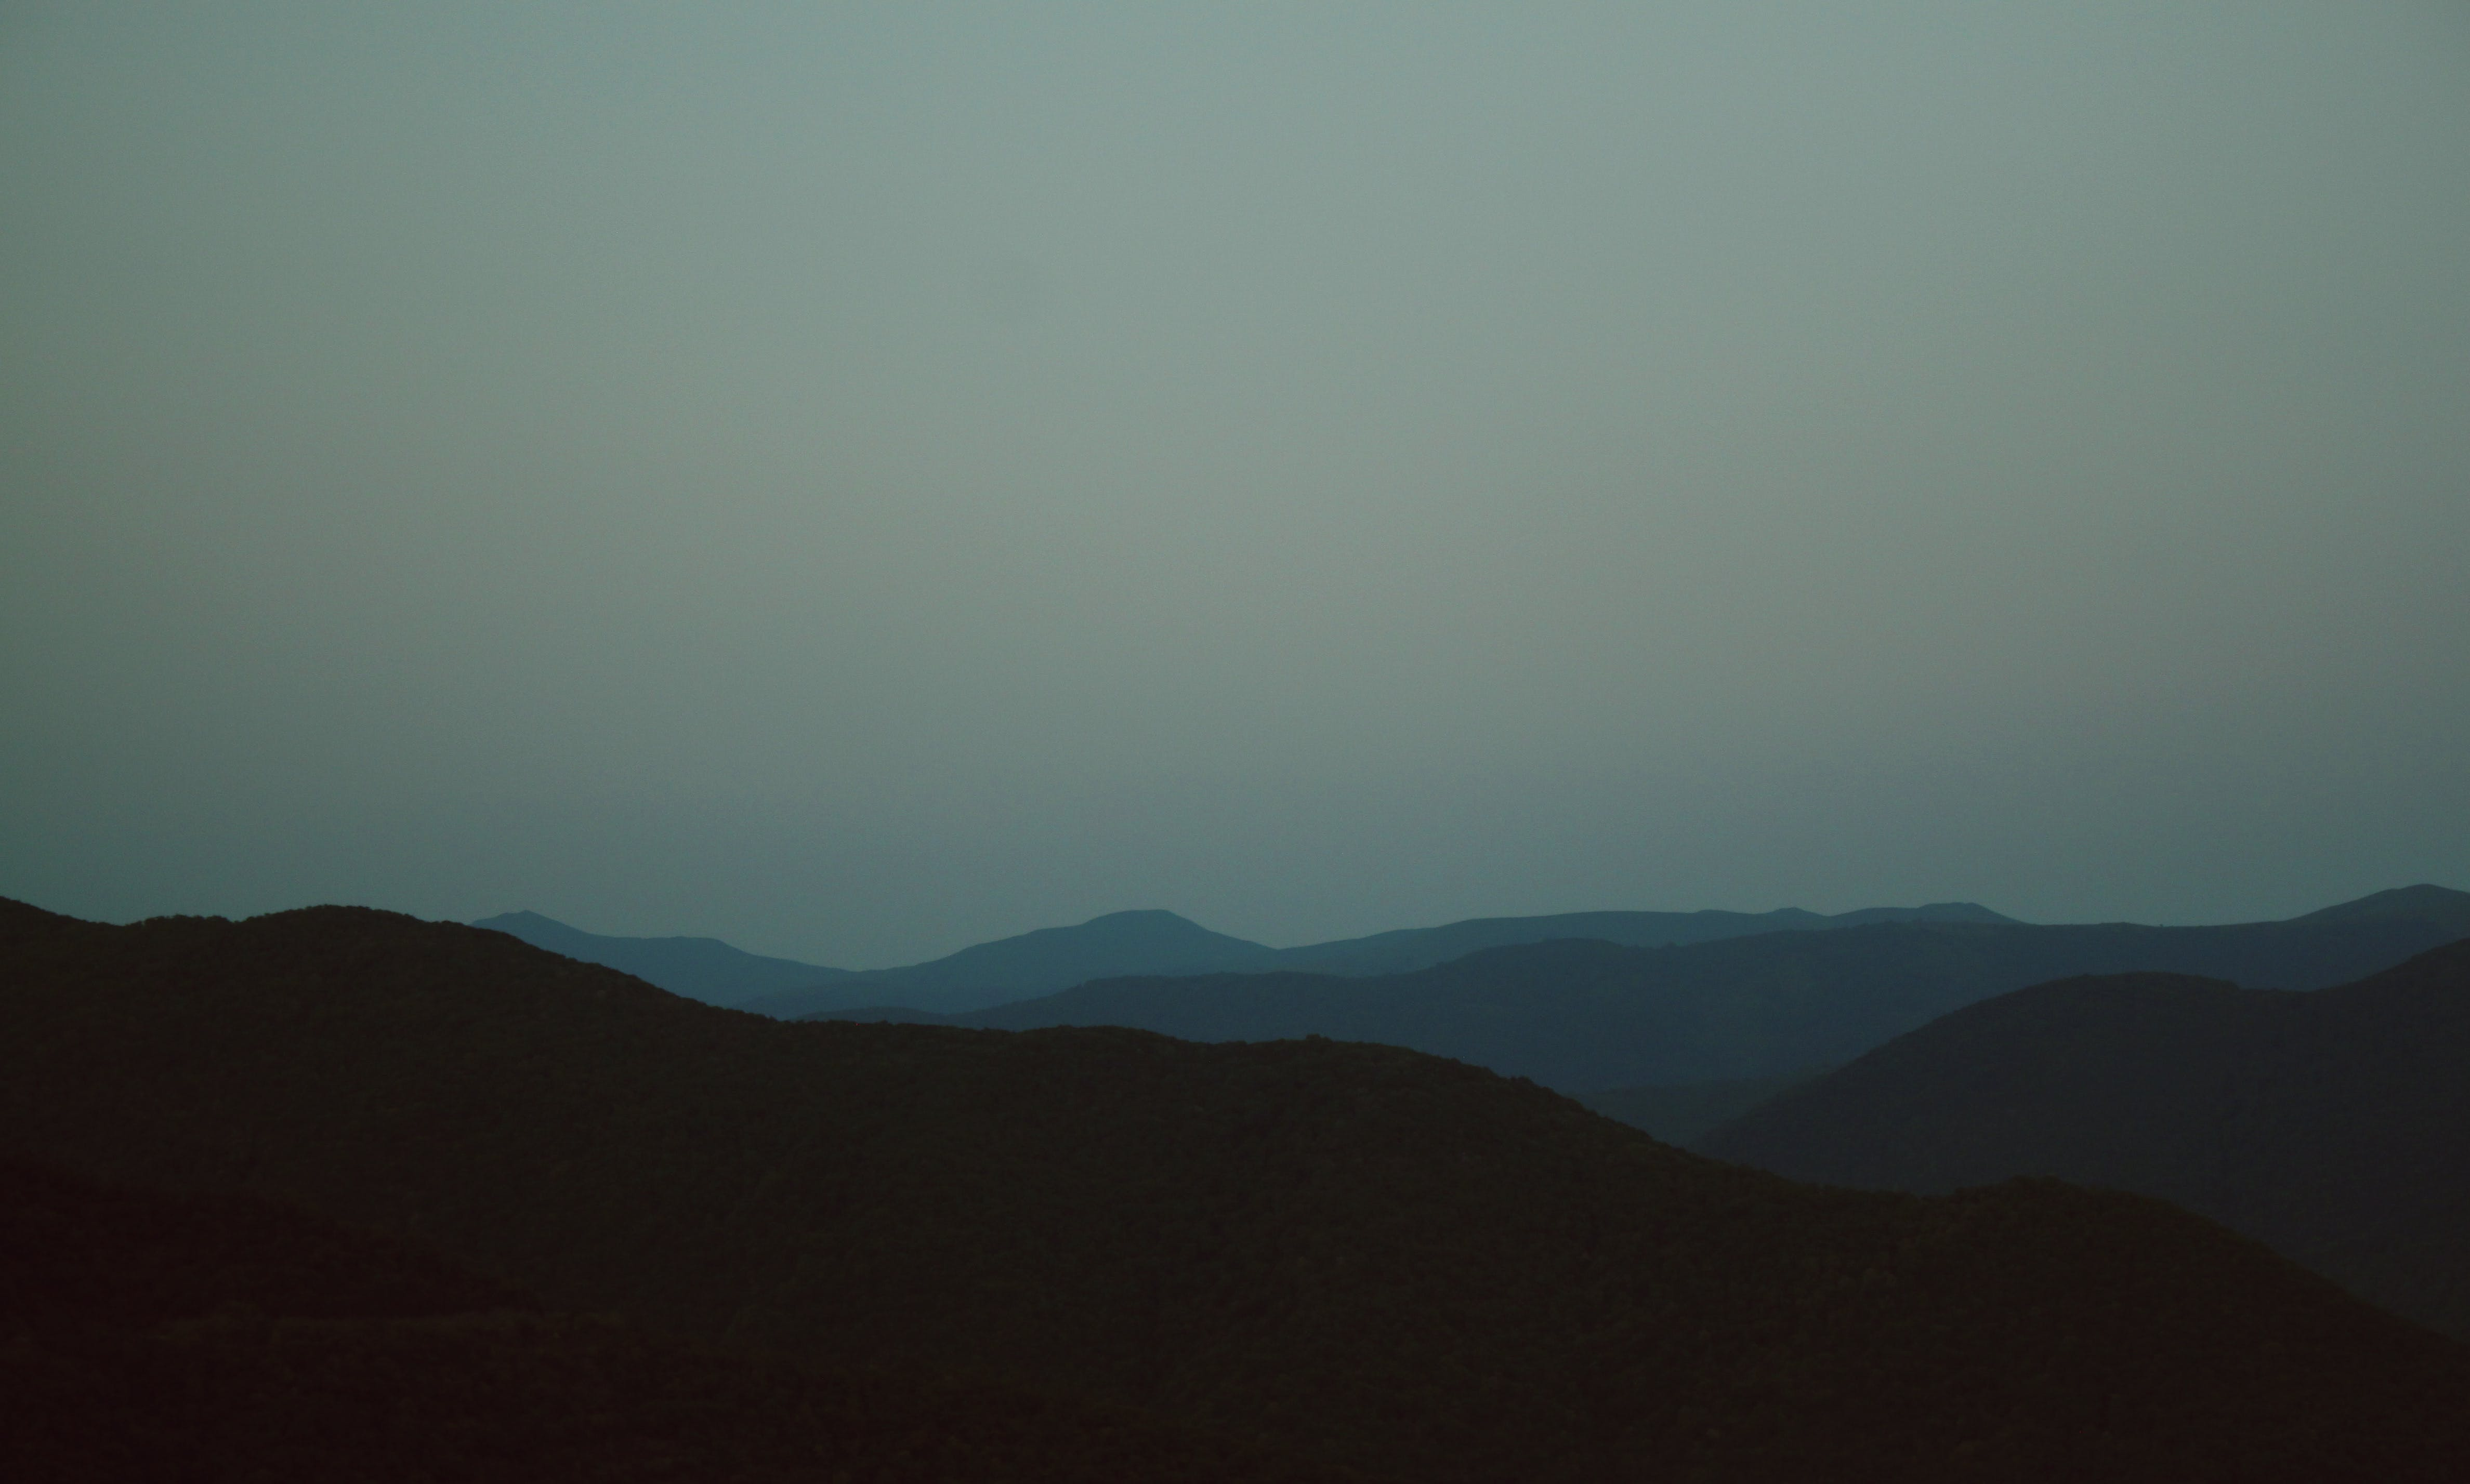 Kostenloses Stock Foto zu berge, natur, himmel, dunkel